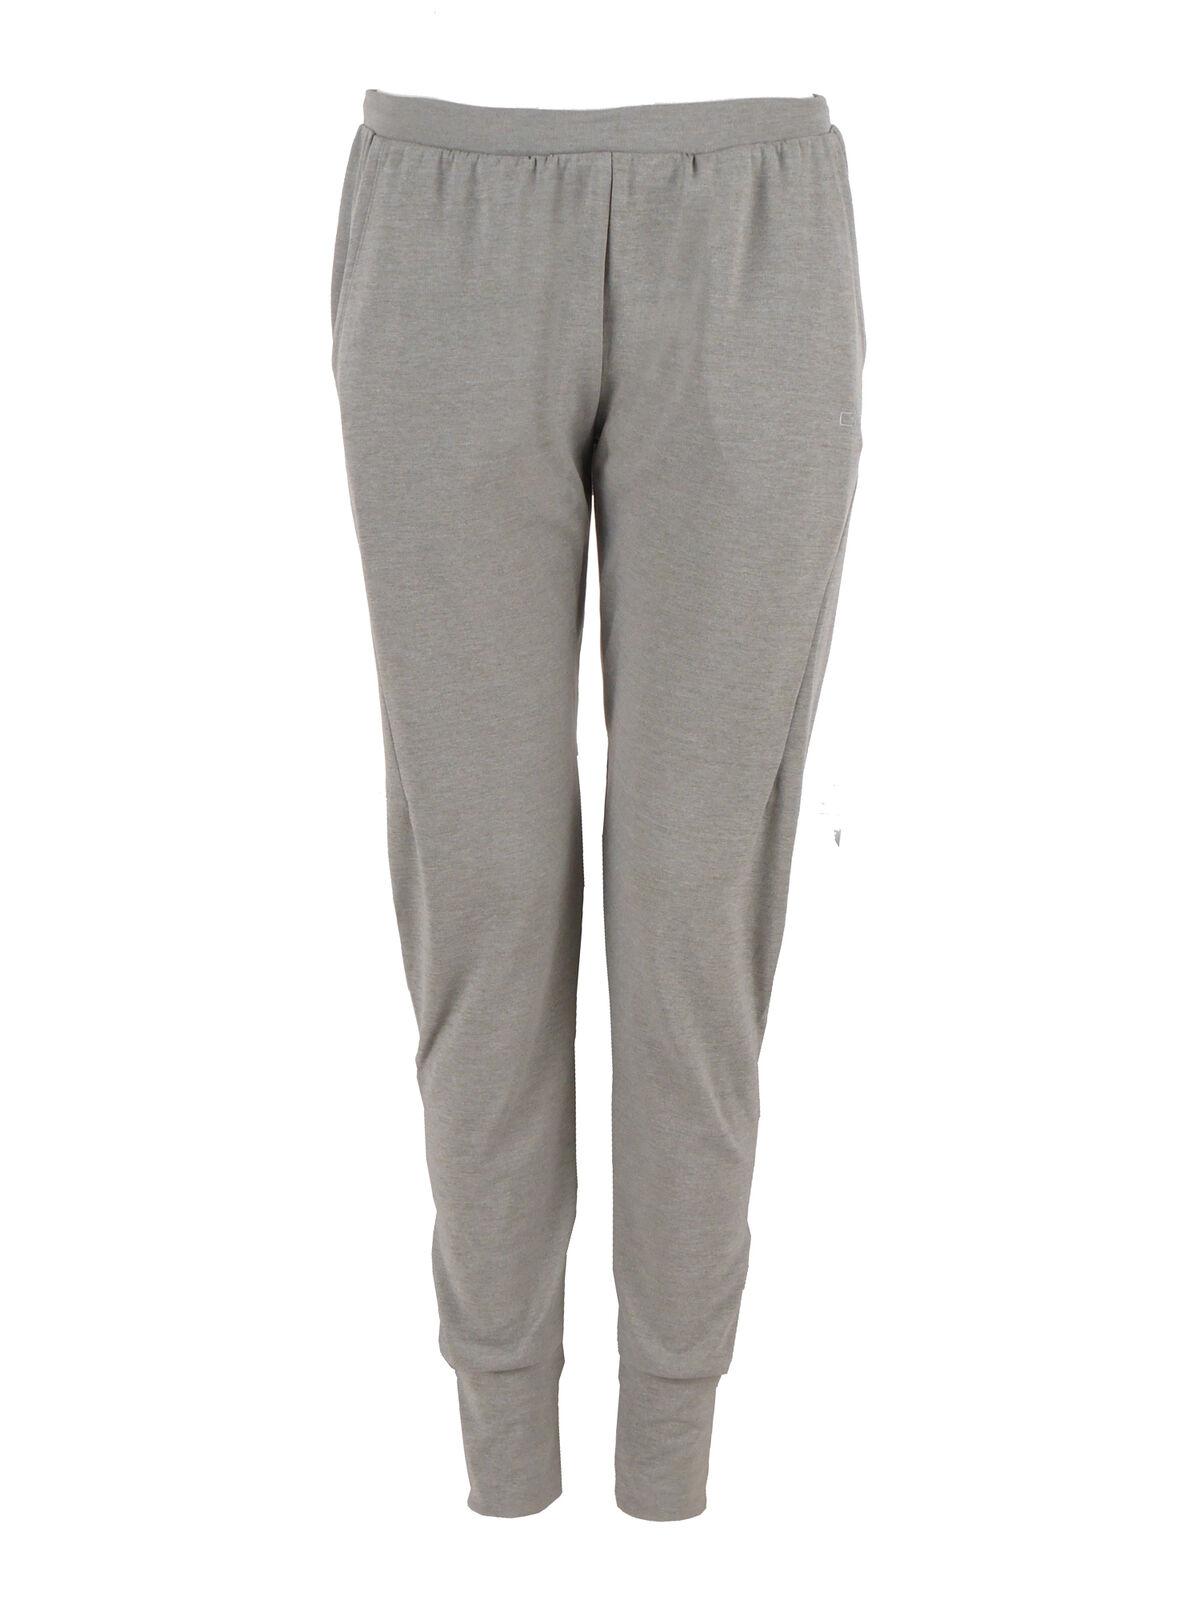 CMP Pantaloni in Pile women Long  Pantaloni grey Traspirante Elastico Leggero  limited edition